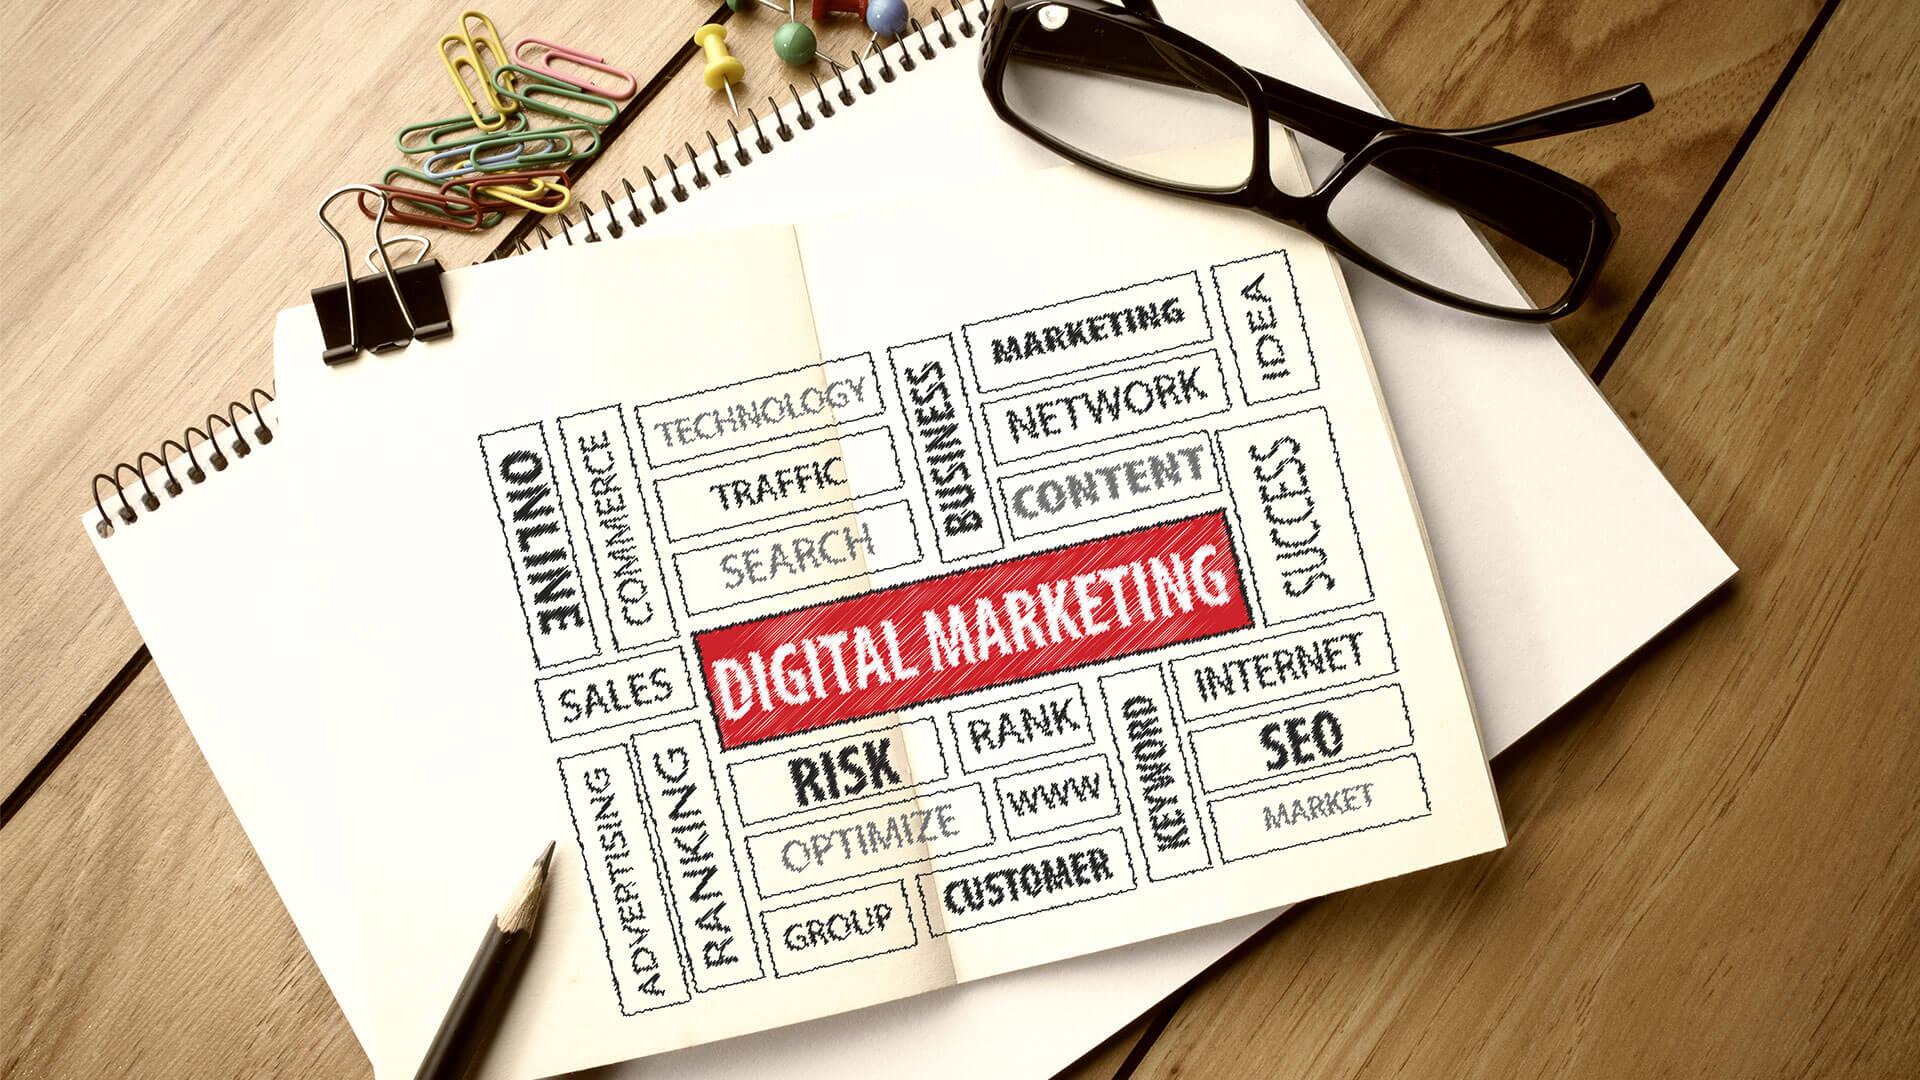 Agencia digital costa rica